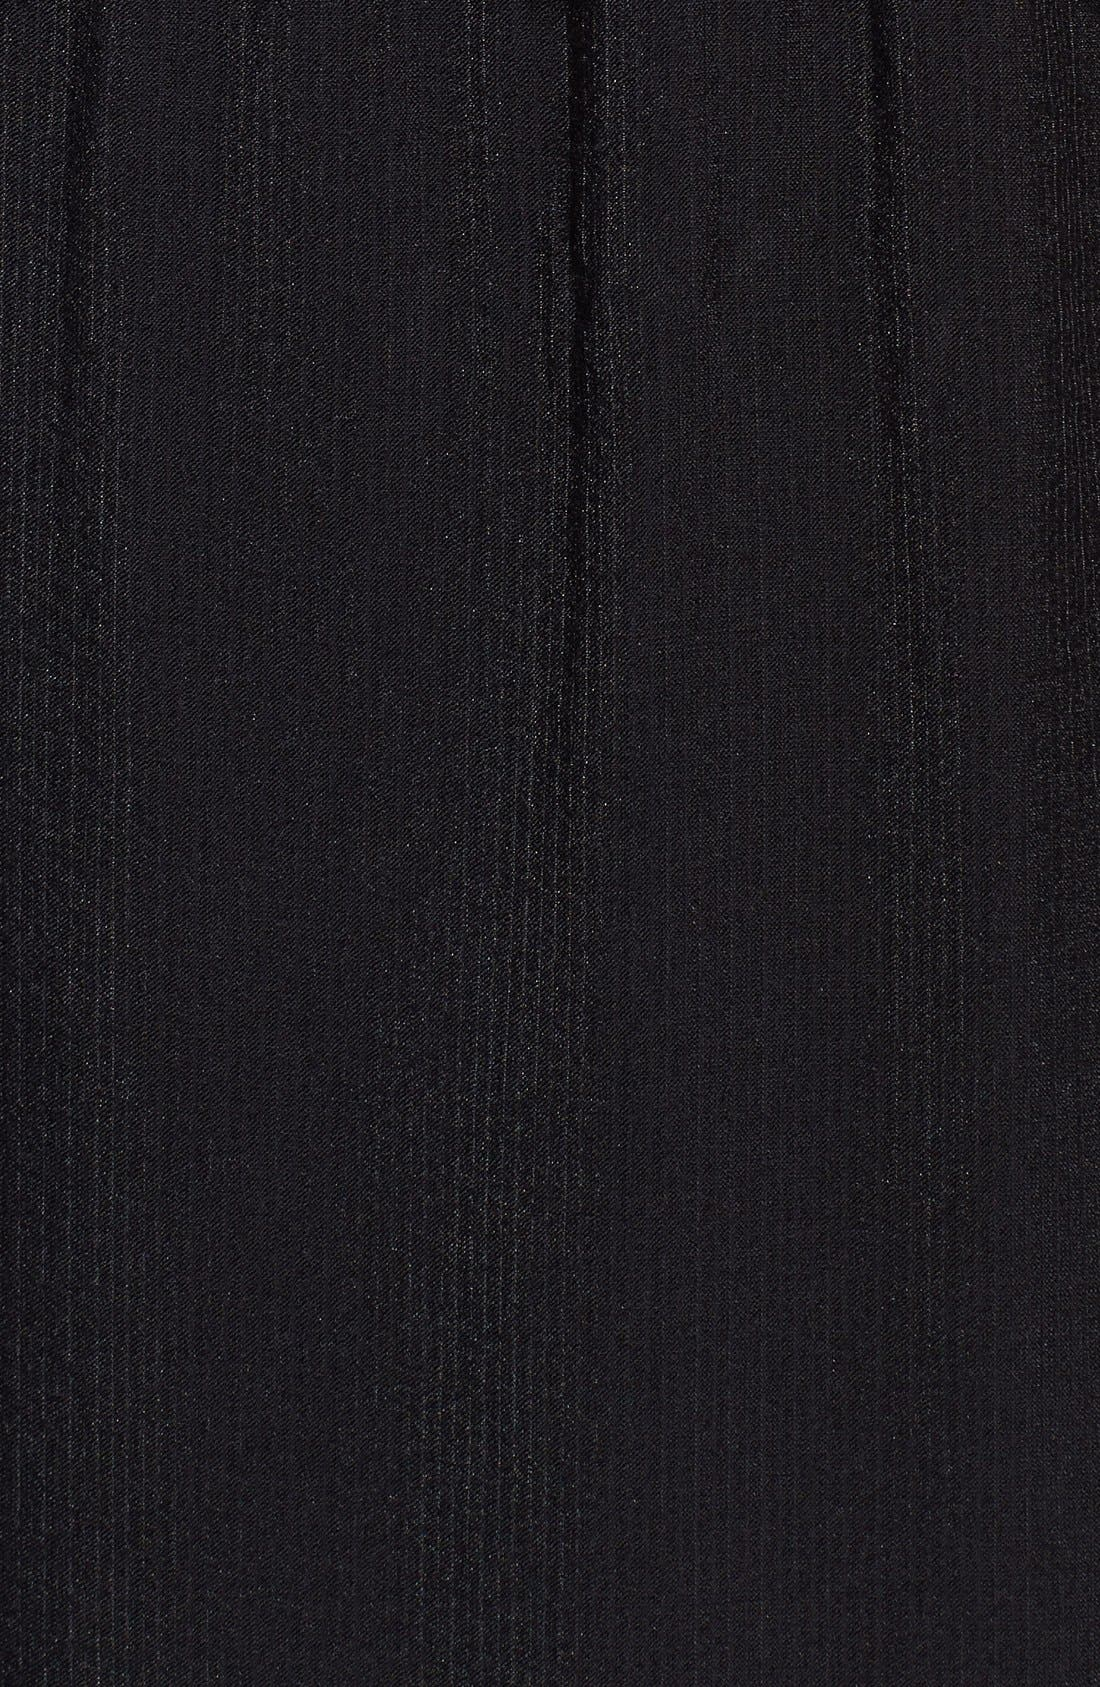 Alternate Image 3  - For Love & Lemons 'Sweet Tea' Lace Trim Crepe Maxi Dress